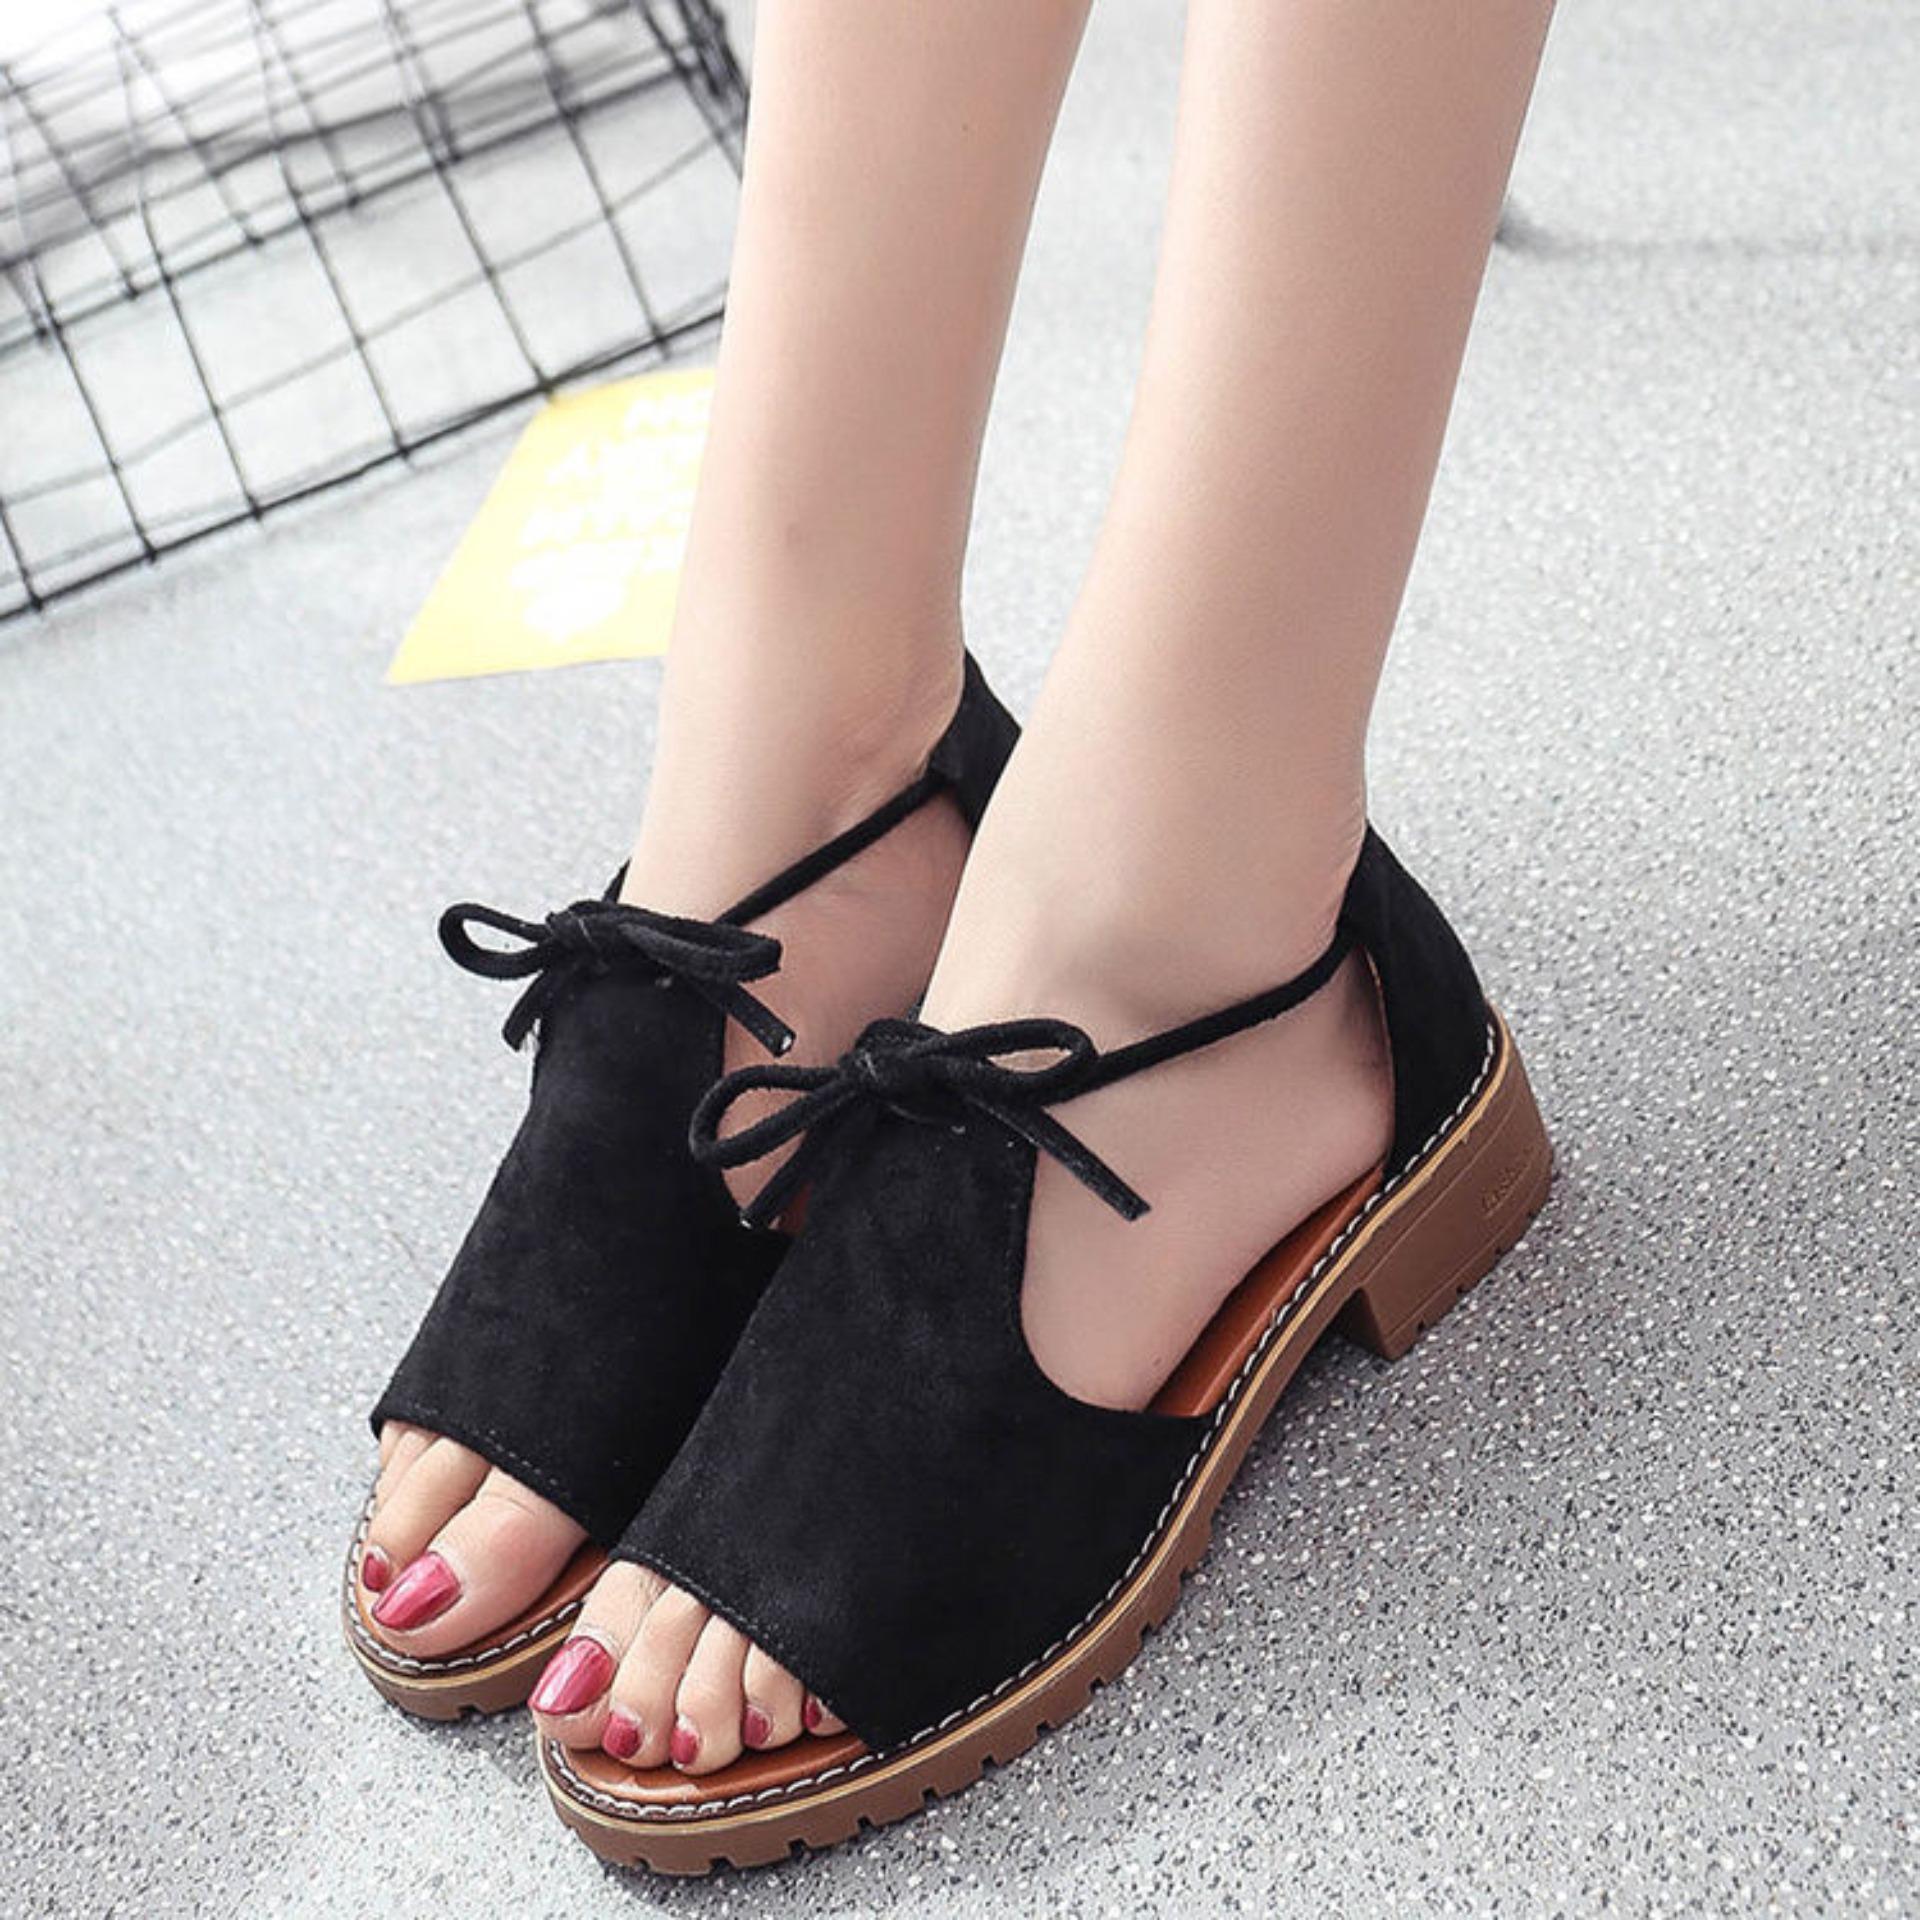 Dr Kevin Shoes Women Sandals 26118 Brown Daftar Update Harga Flat 43125 Cokelat Muda 37 Nyaman Di Pakai Azkashoes Sandal Wanita Pnd03 Hitam Tali